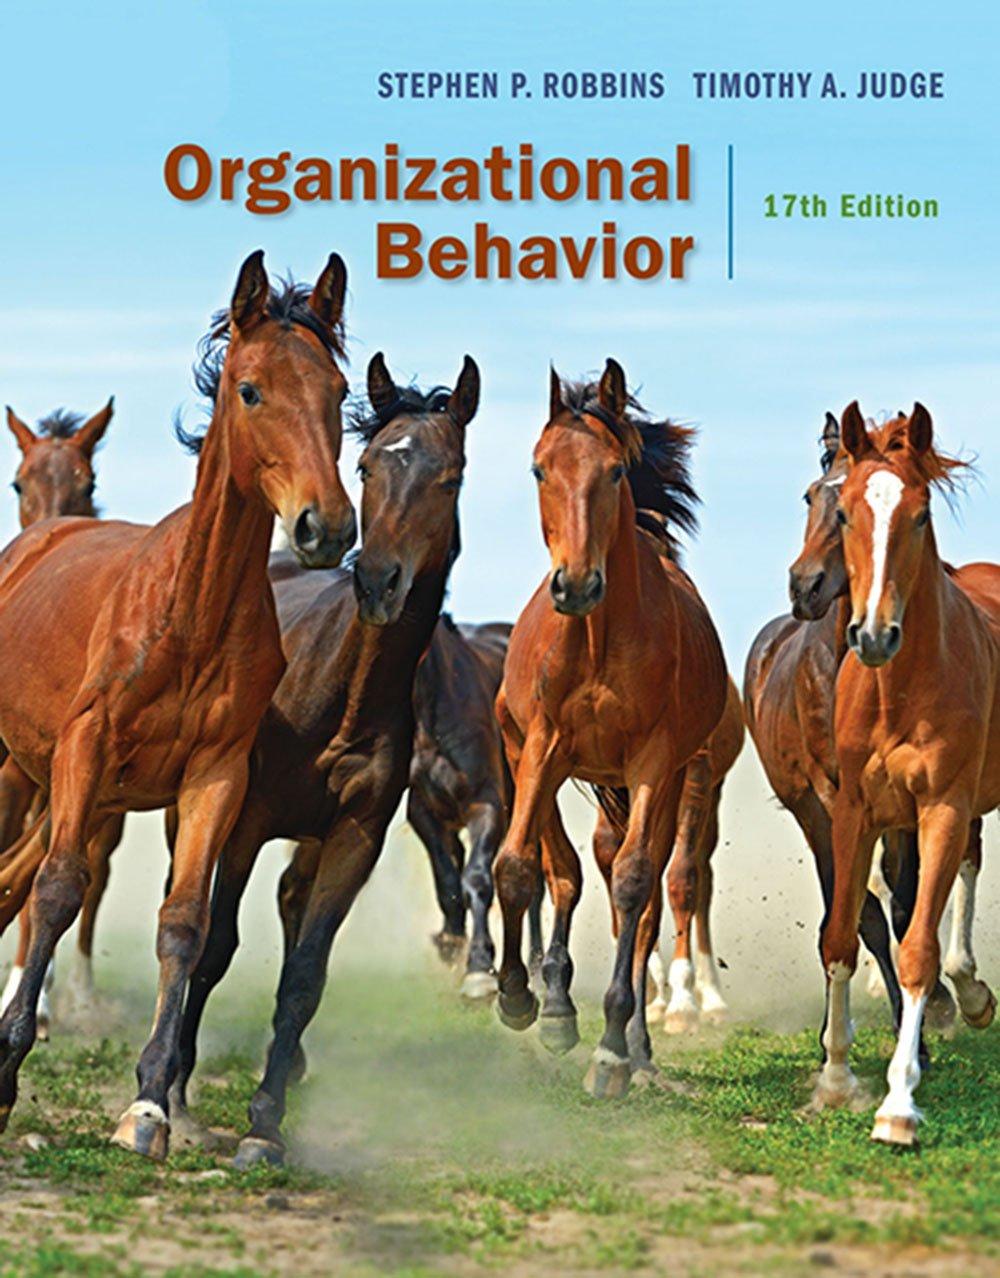 Organizational Behavior 17th Edition Pdf Free Download